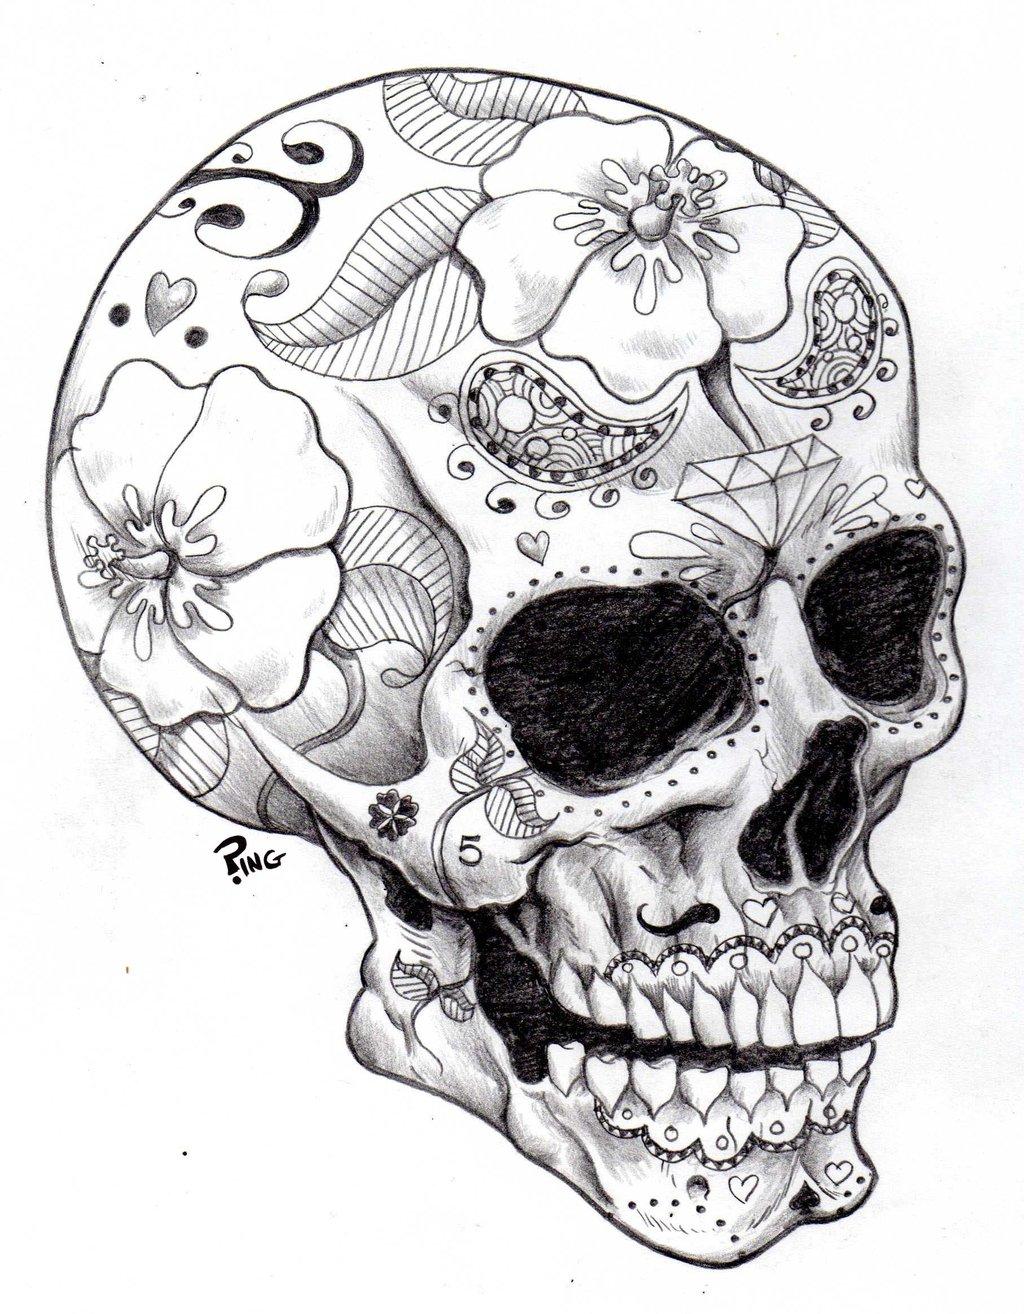 1024x1314 Candy Skull Drawing Candy Skull Sketch Skull Drawings Sugar